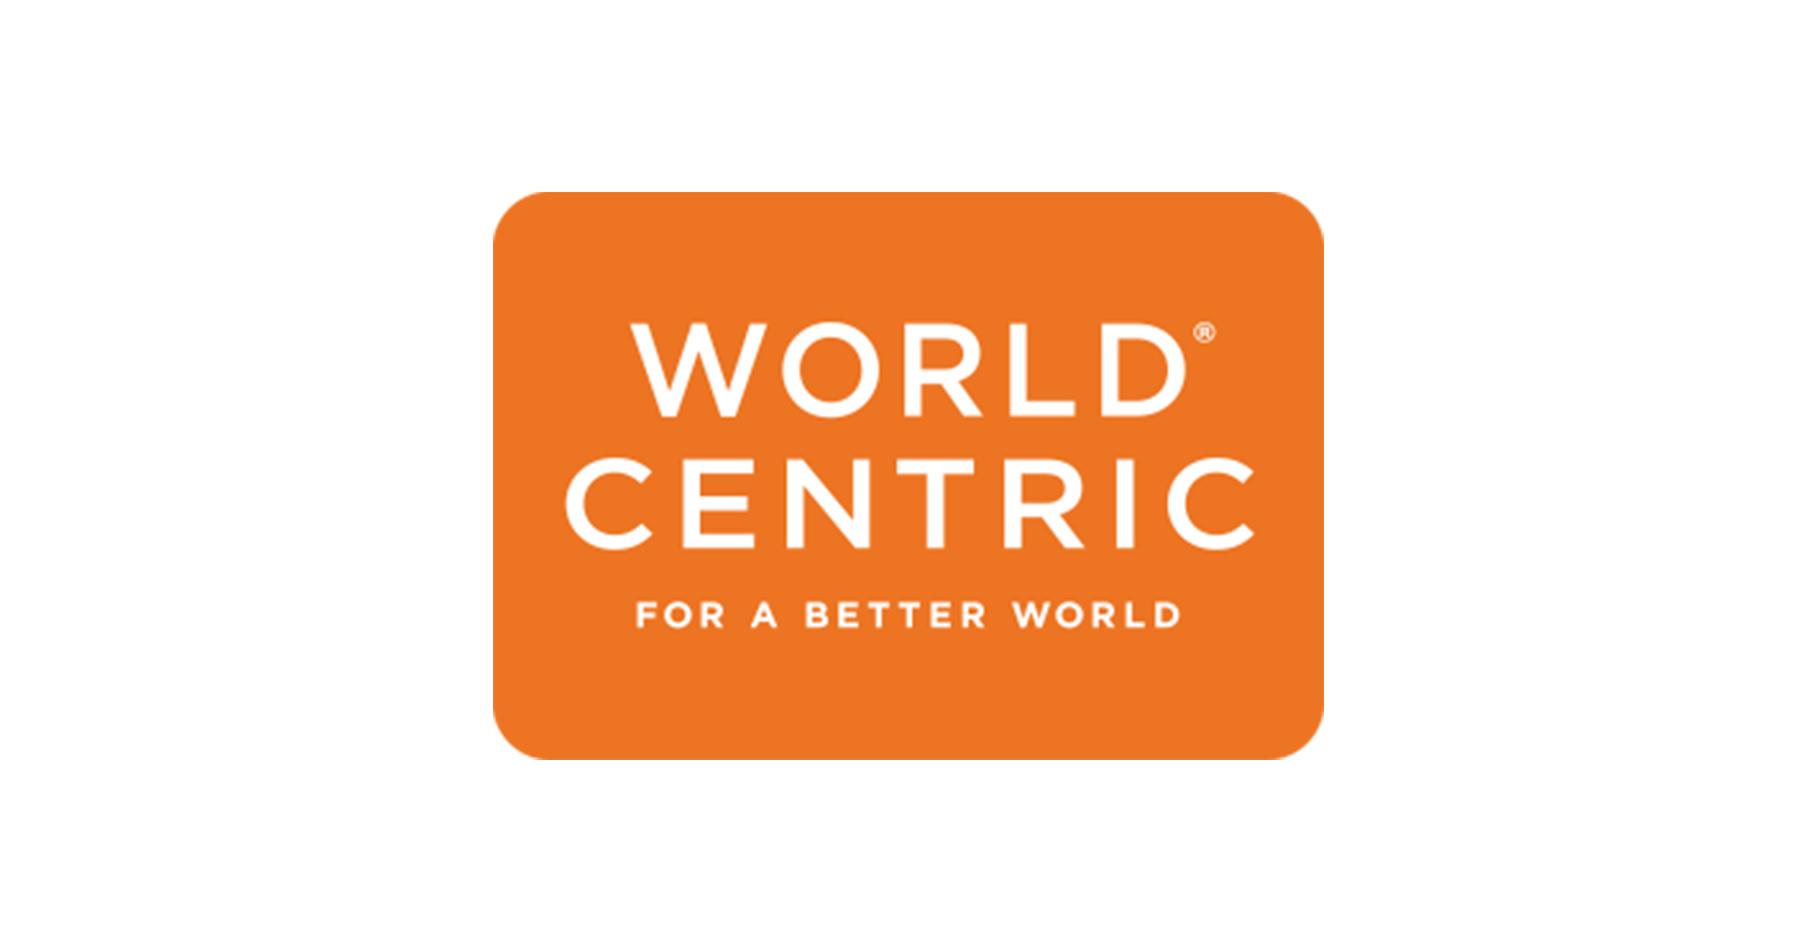 world centric